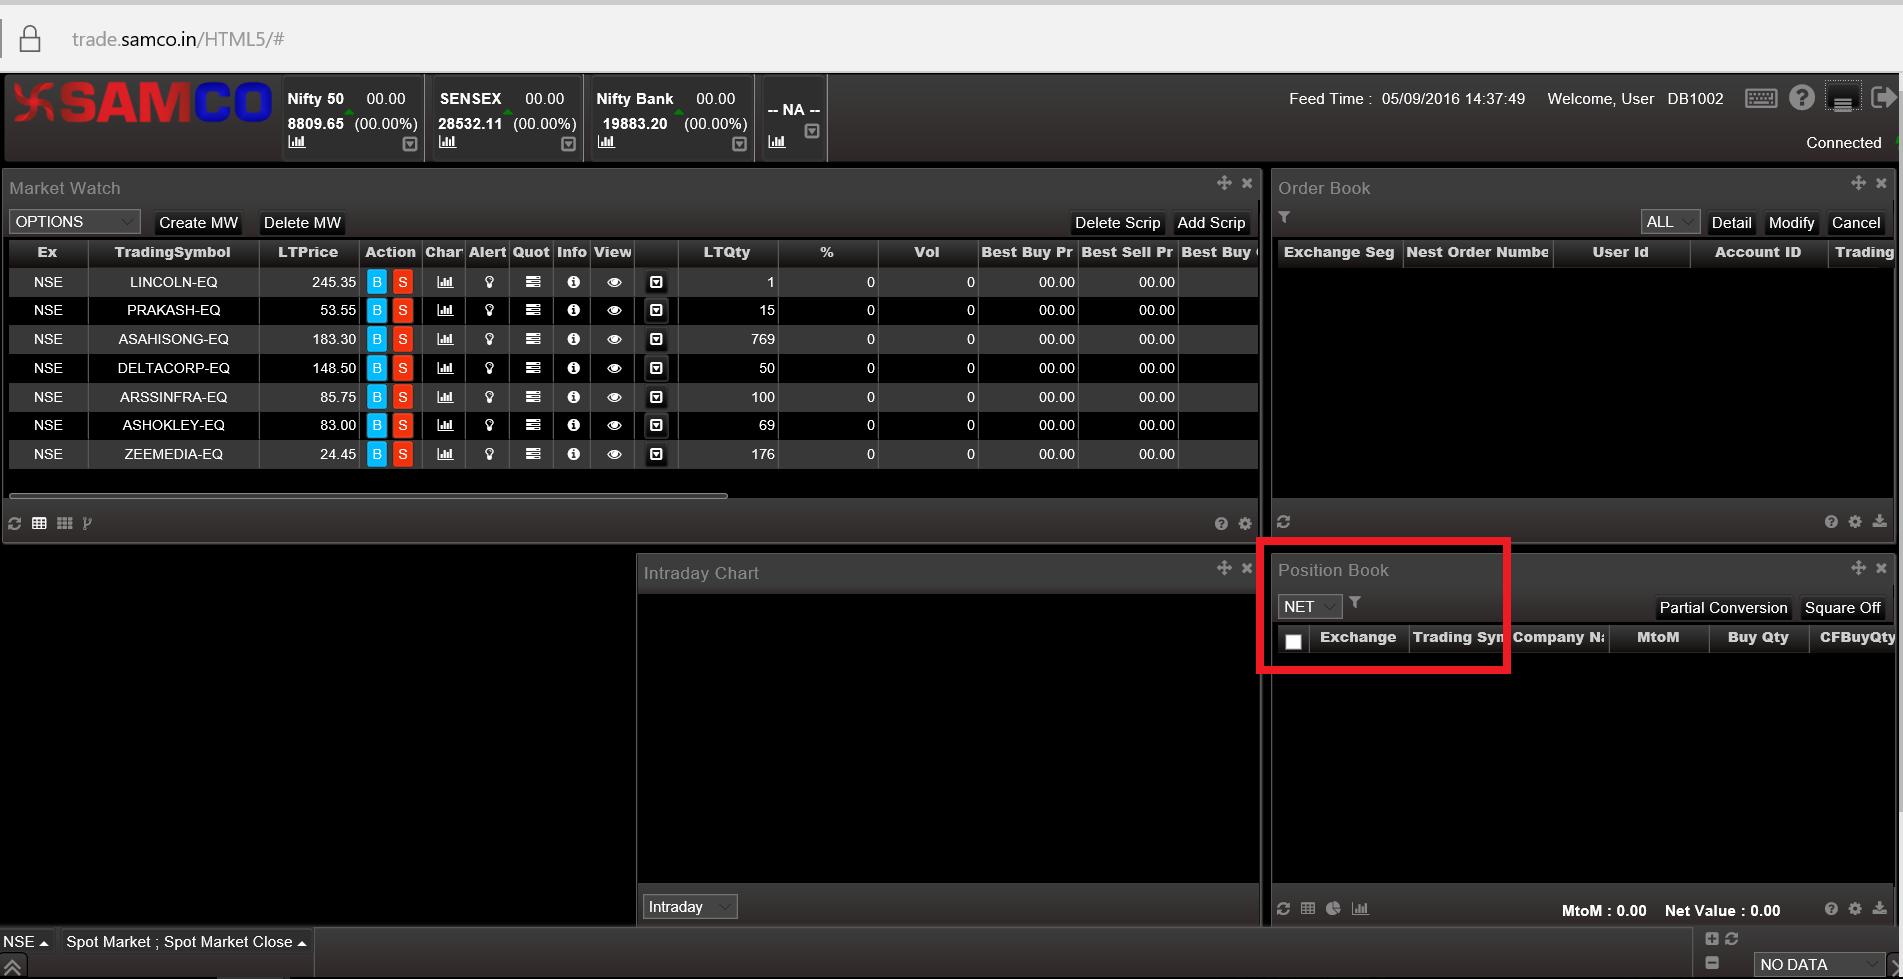 SAMCO Web Xpress - Adding Position Book Window to Dashboard